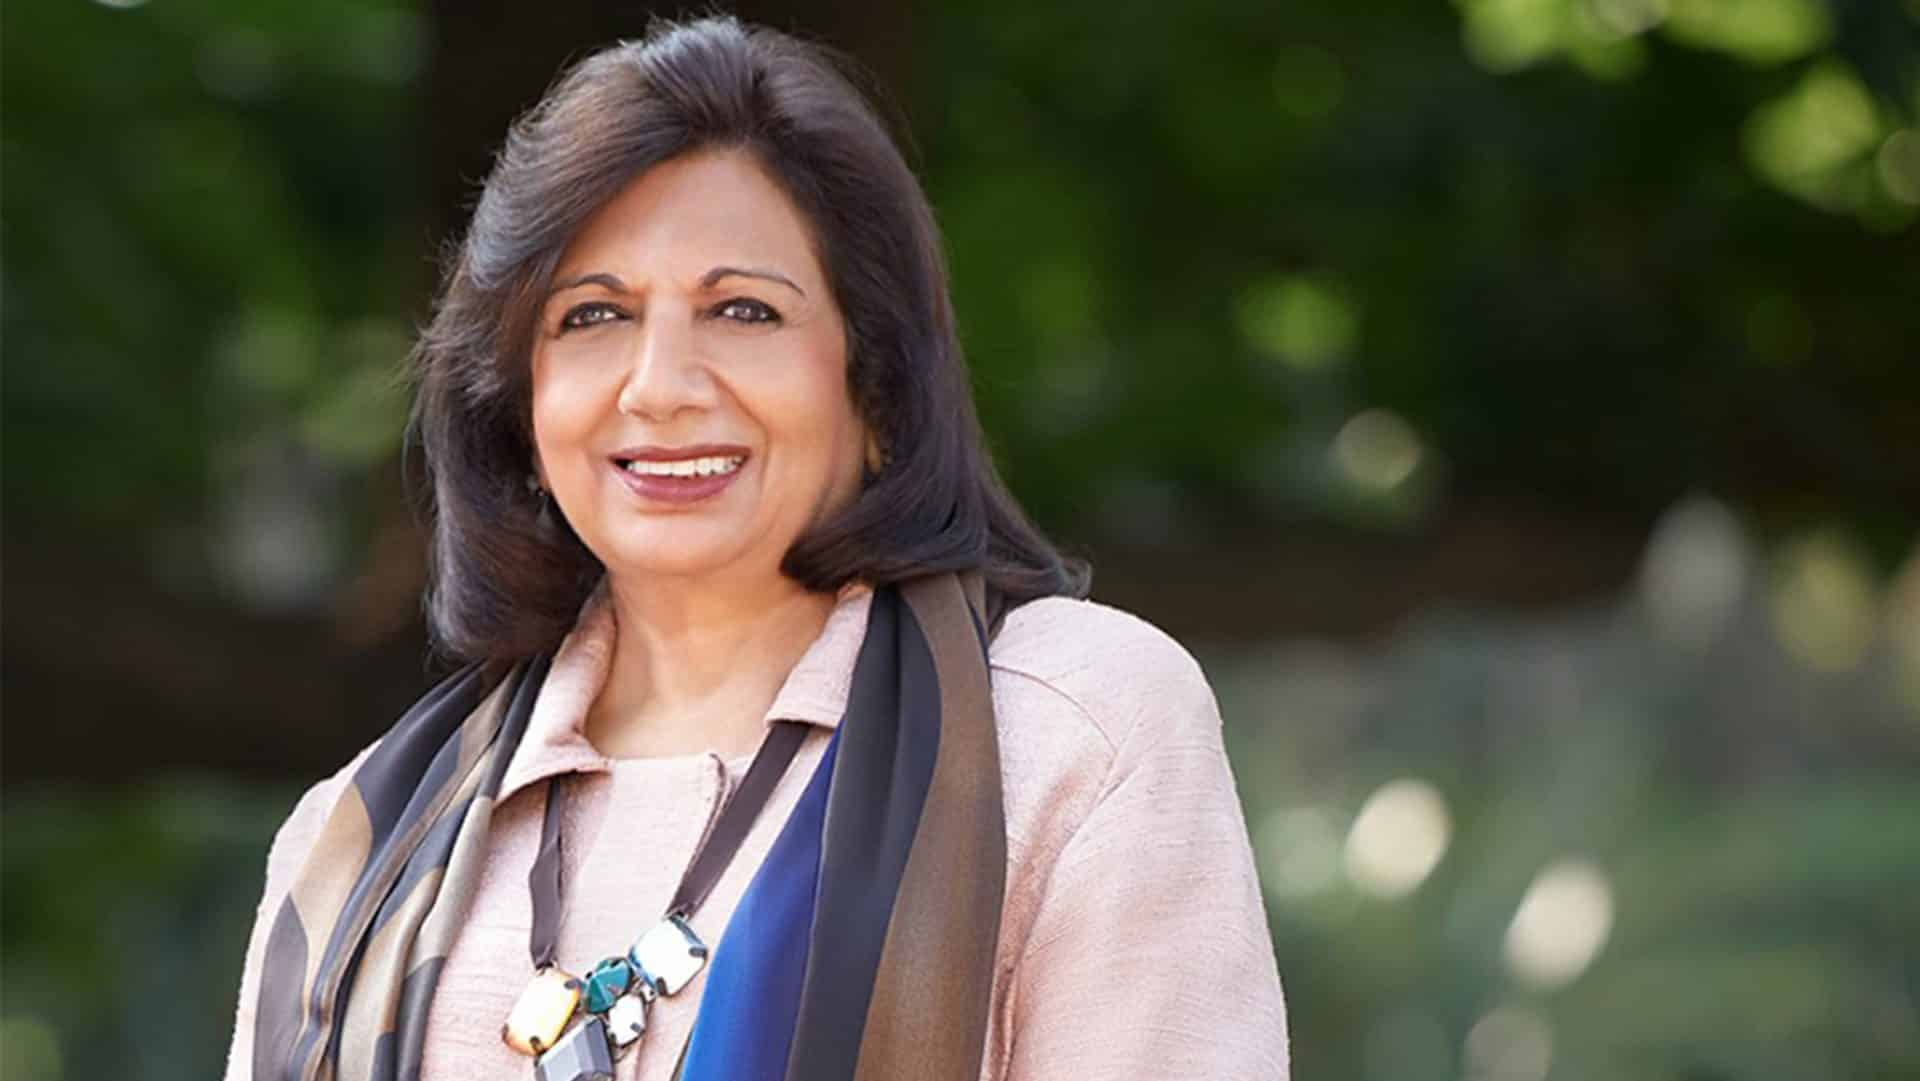 Covid has created an 'ecosystem' of innovation in India: Kiran Mazumdar Shaw